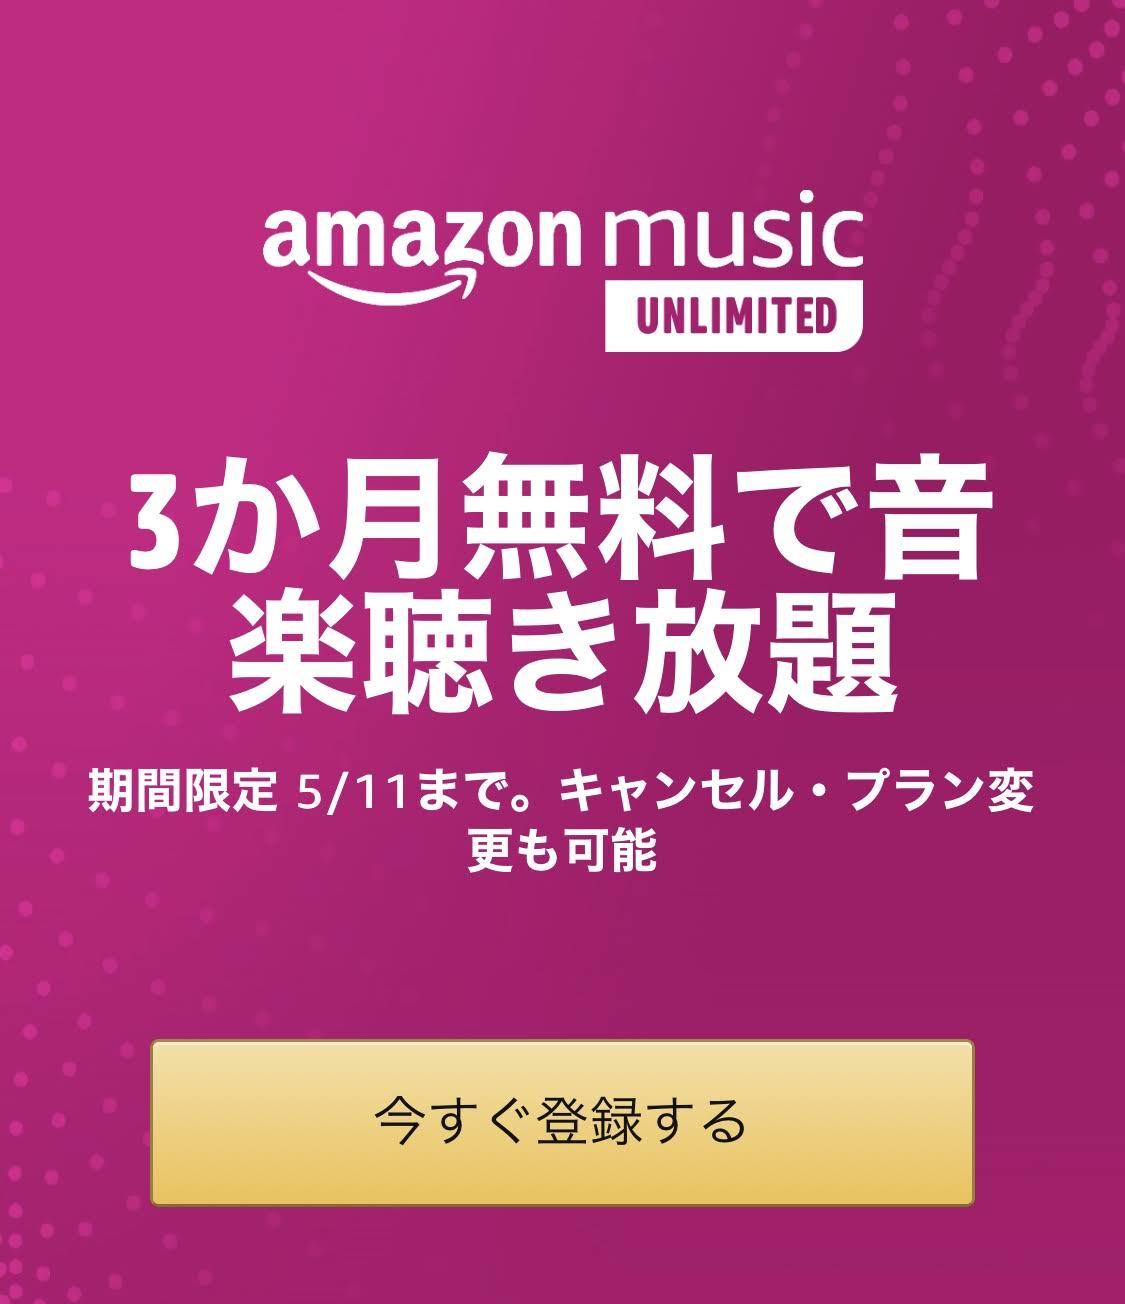 amazon music unlimited期間限定無料キャンペーン